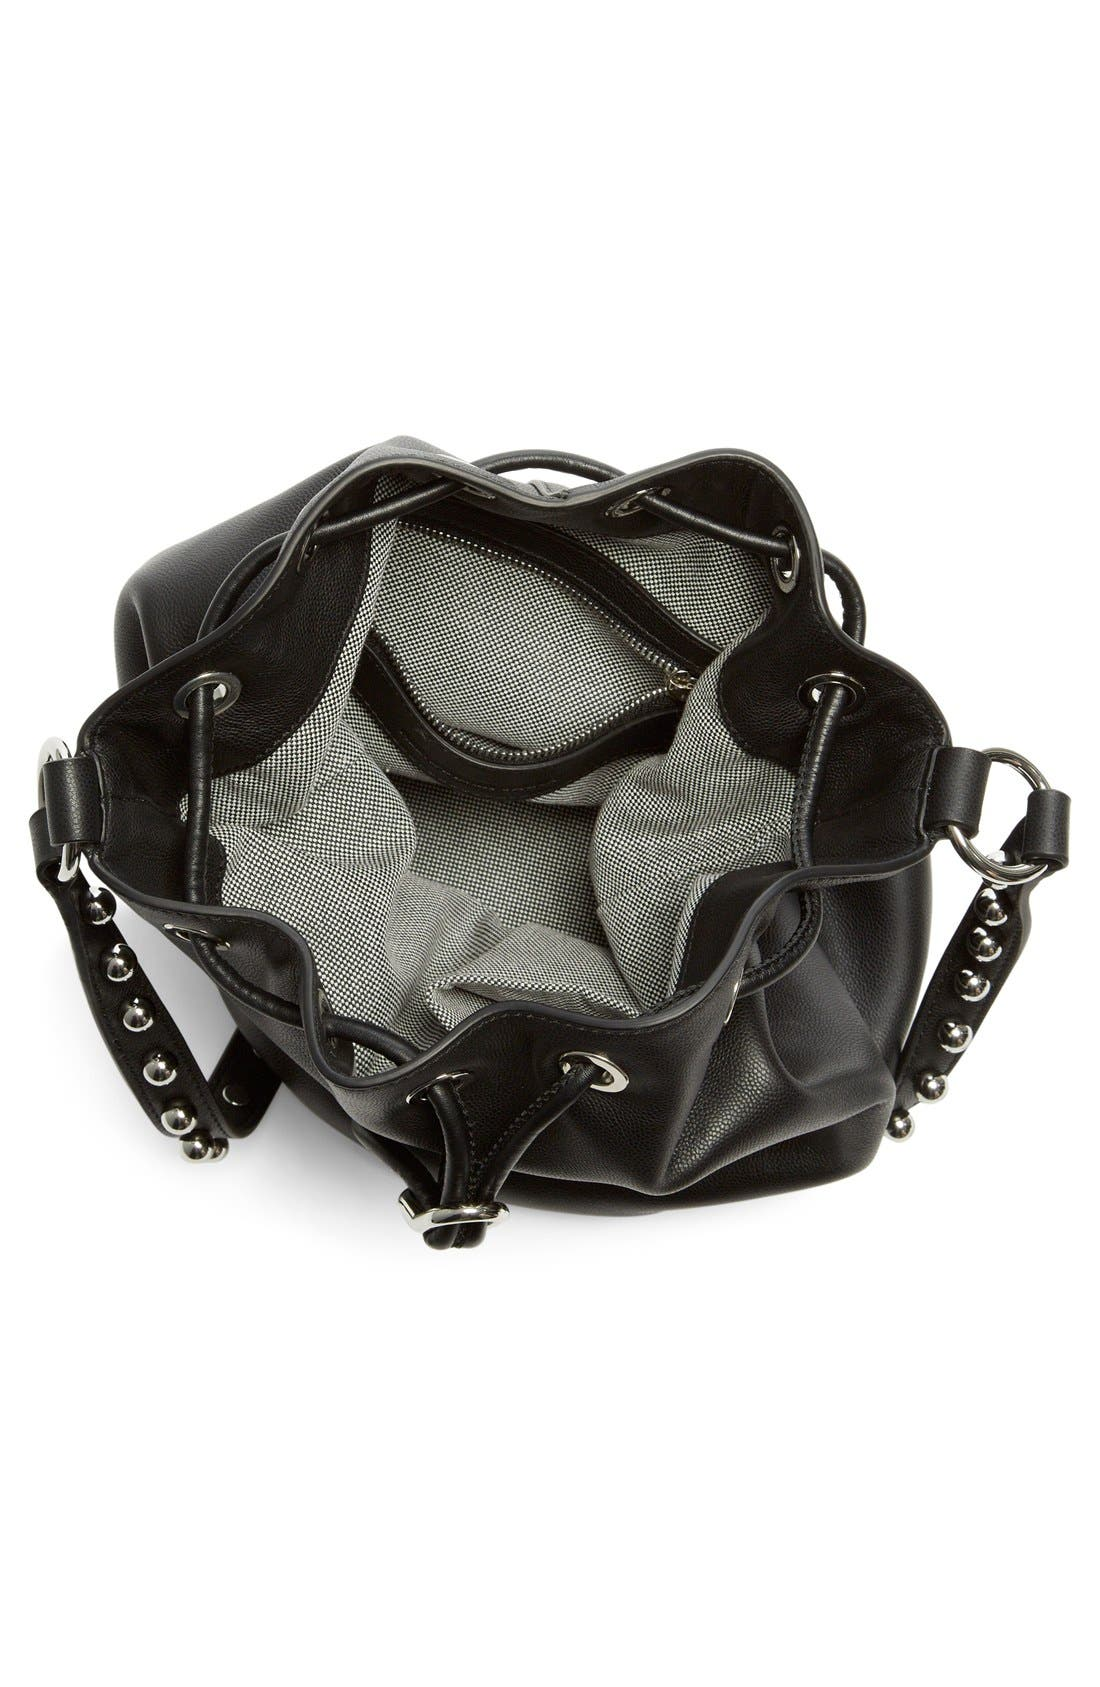 ALEXANDER WANG, 'Alfa' Studded Leather Bucket Bag, Alternate thumbnail 6, color, 001